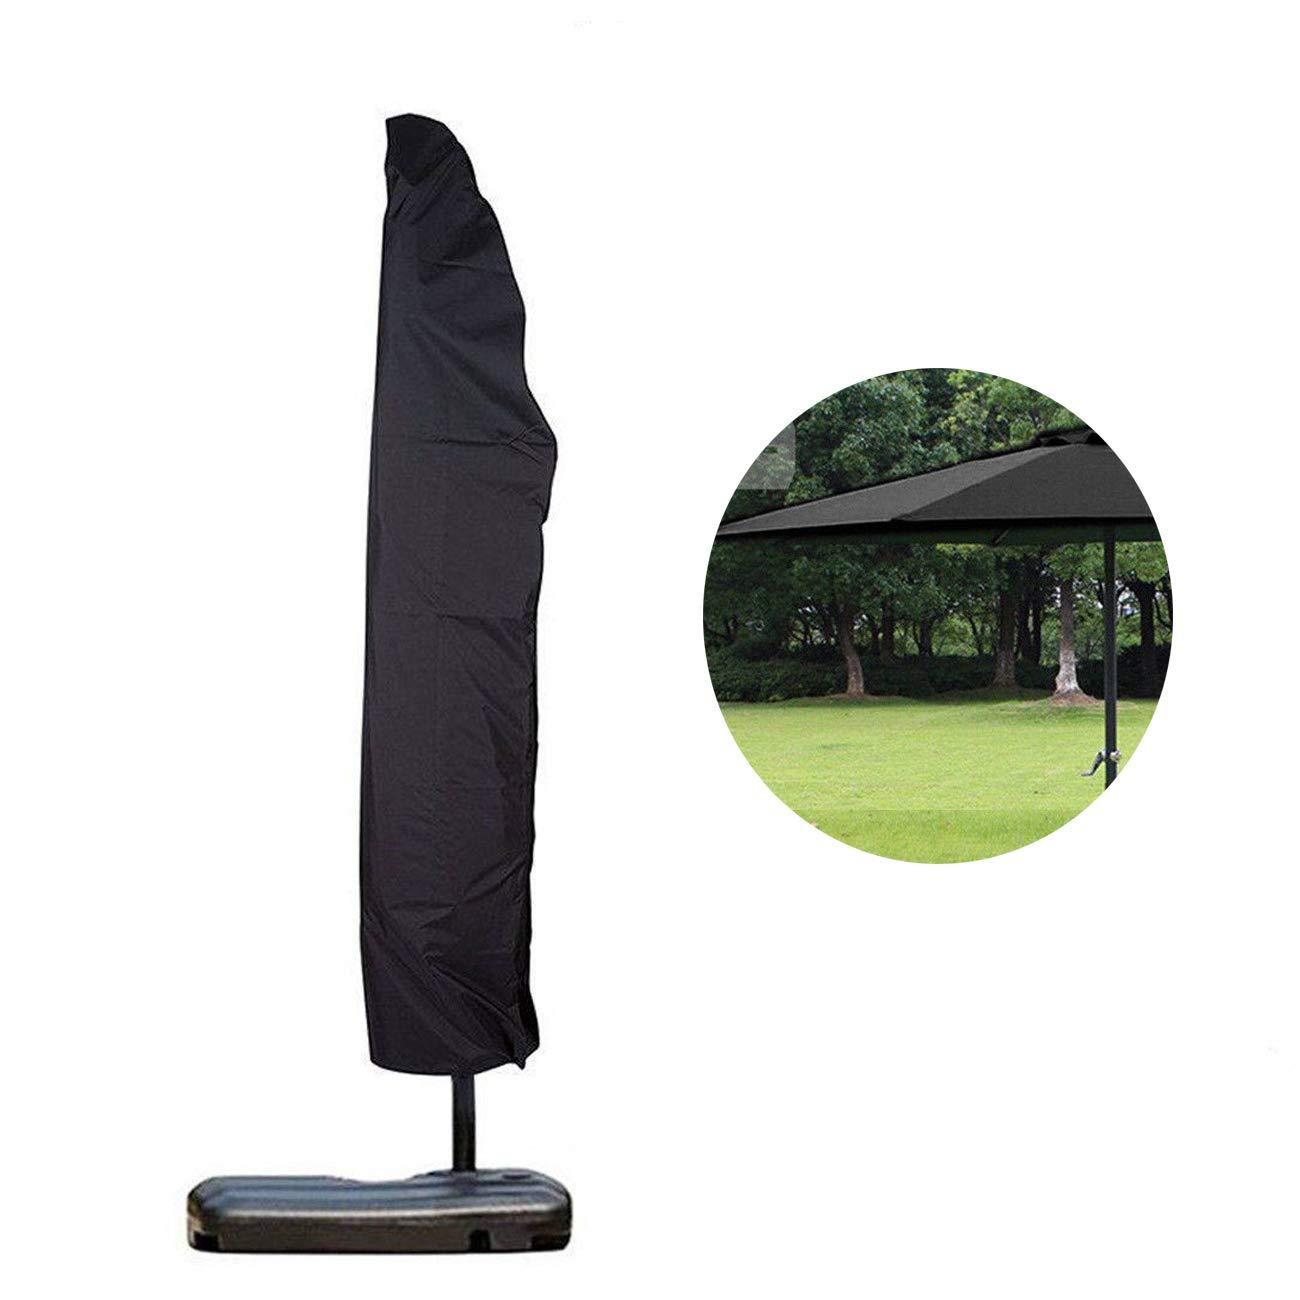 NBRTT Outdoor Waterproof Patio Umbrella with Zipper, Polyester Canopy, Rain Cover, Protective Parasol, Sun Bag